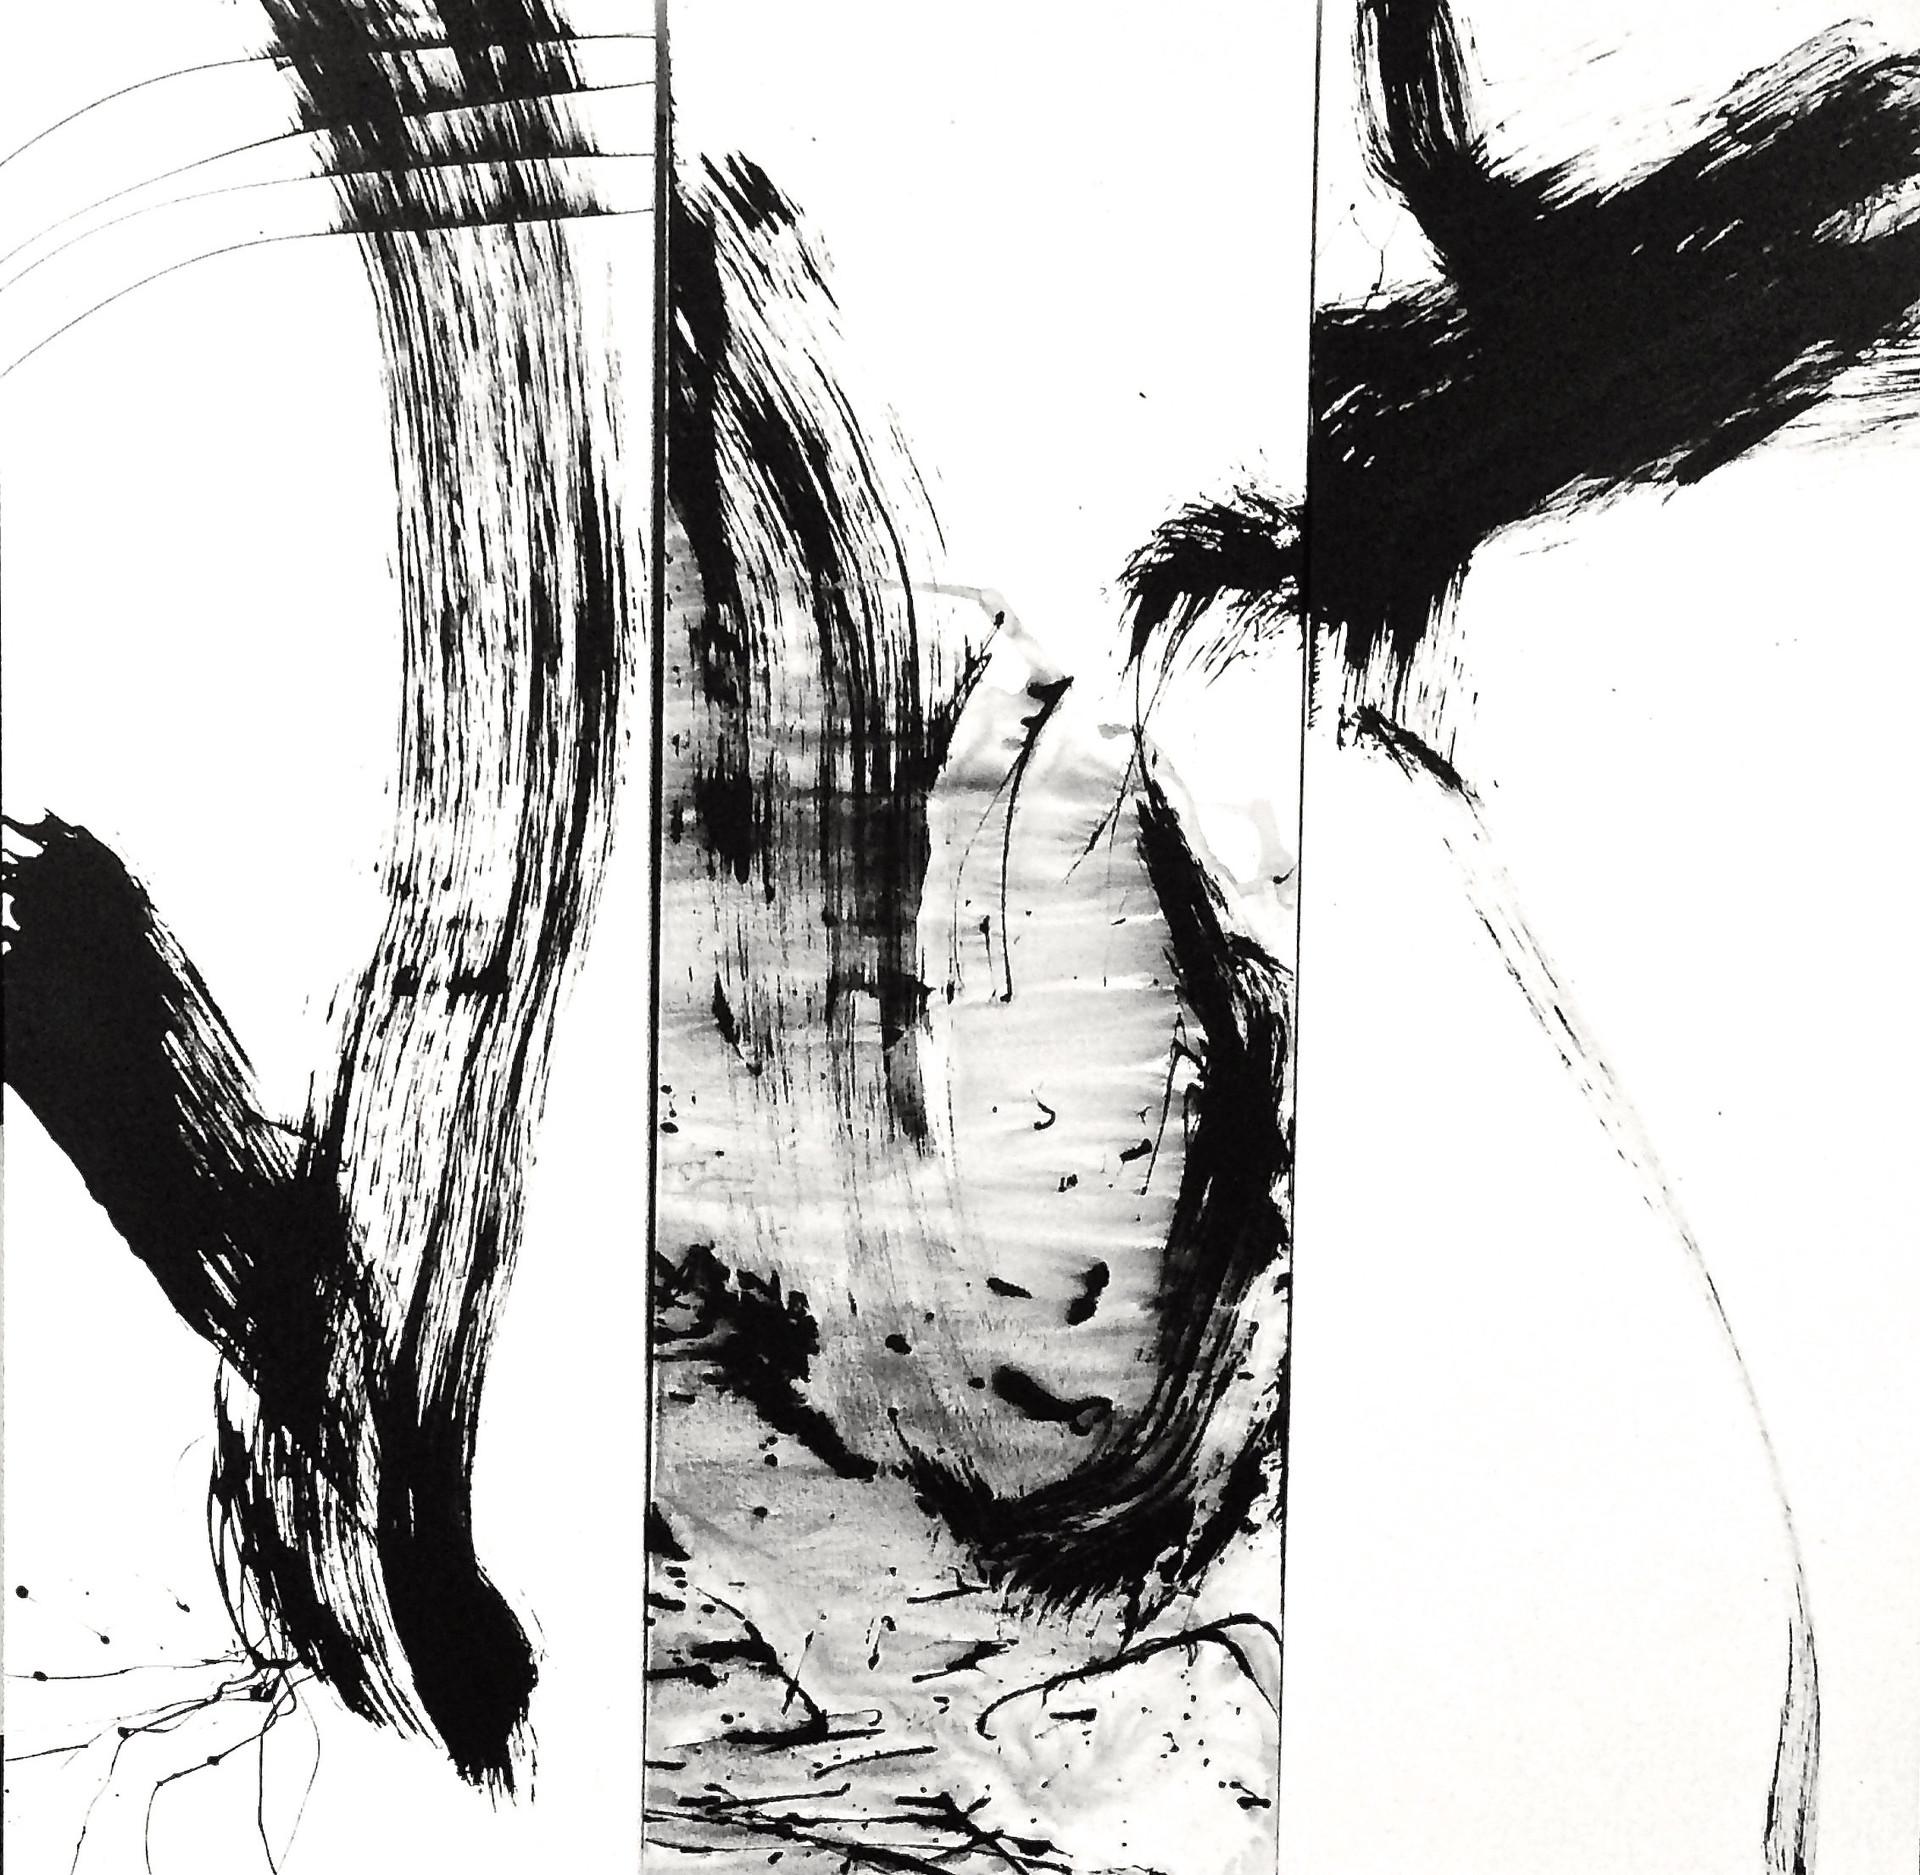 Swordcut Panels (Triptych)